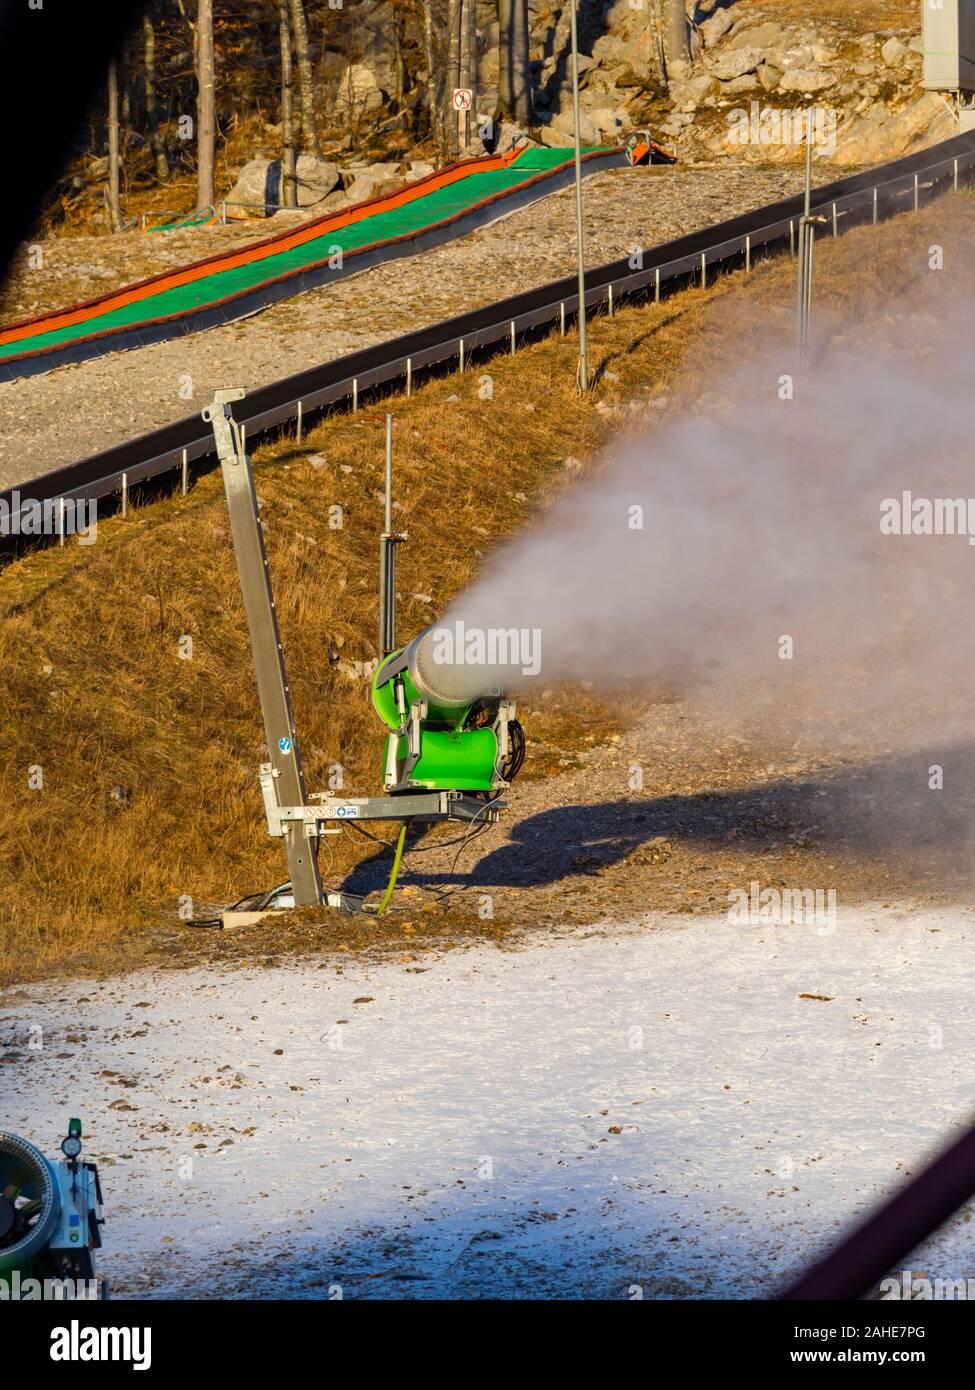 Start od artificial snow making snowflakes Platak Winter resort near Rijeka in Croatia Stock Photo